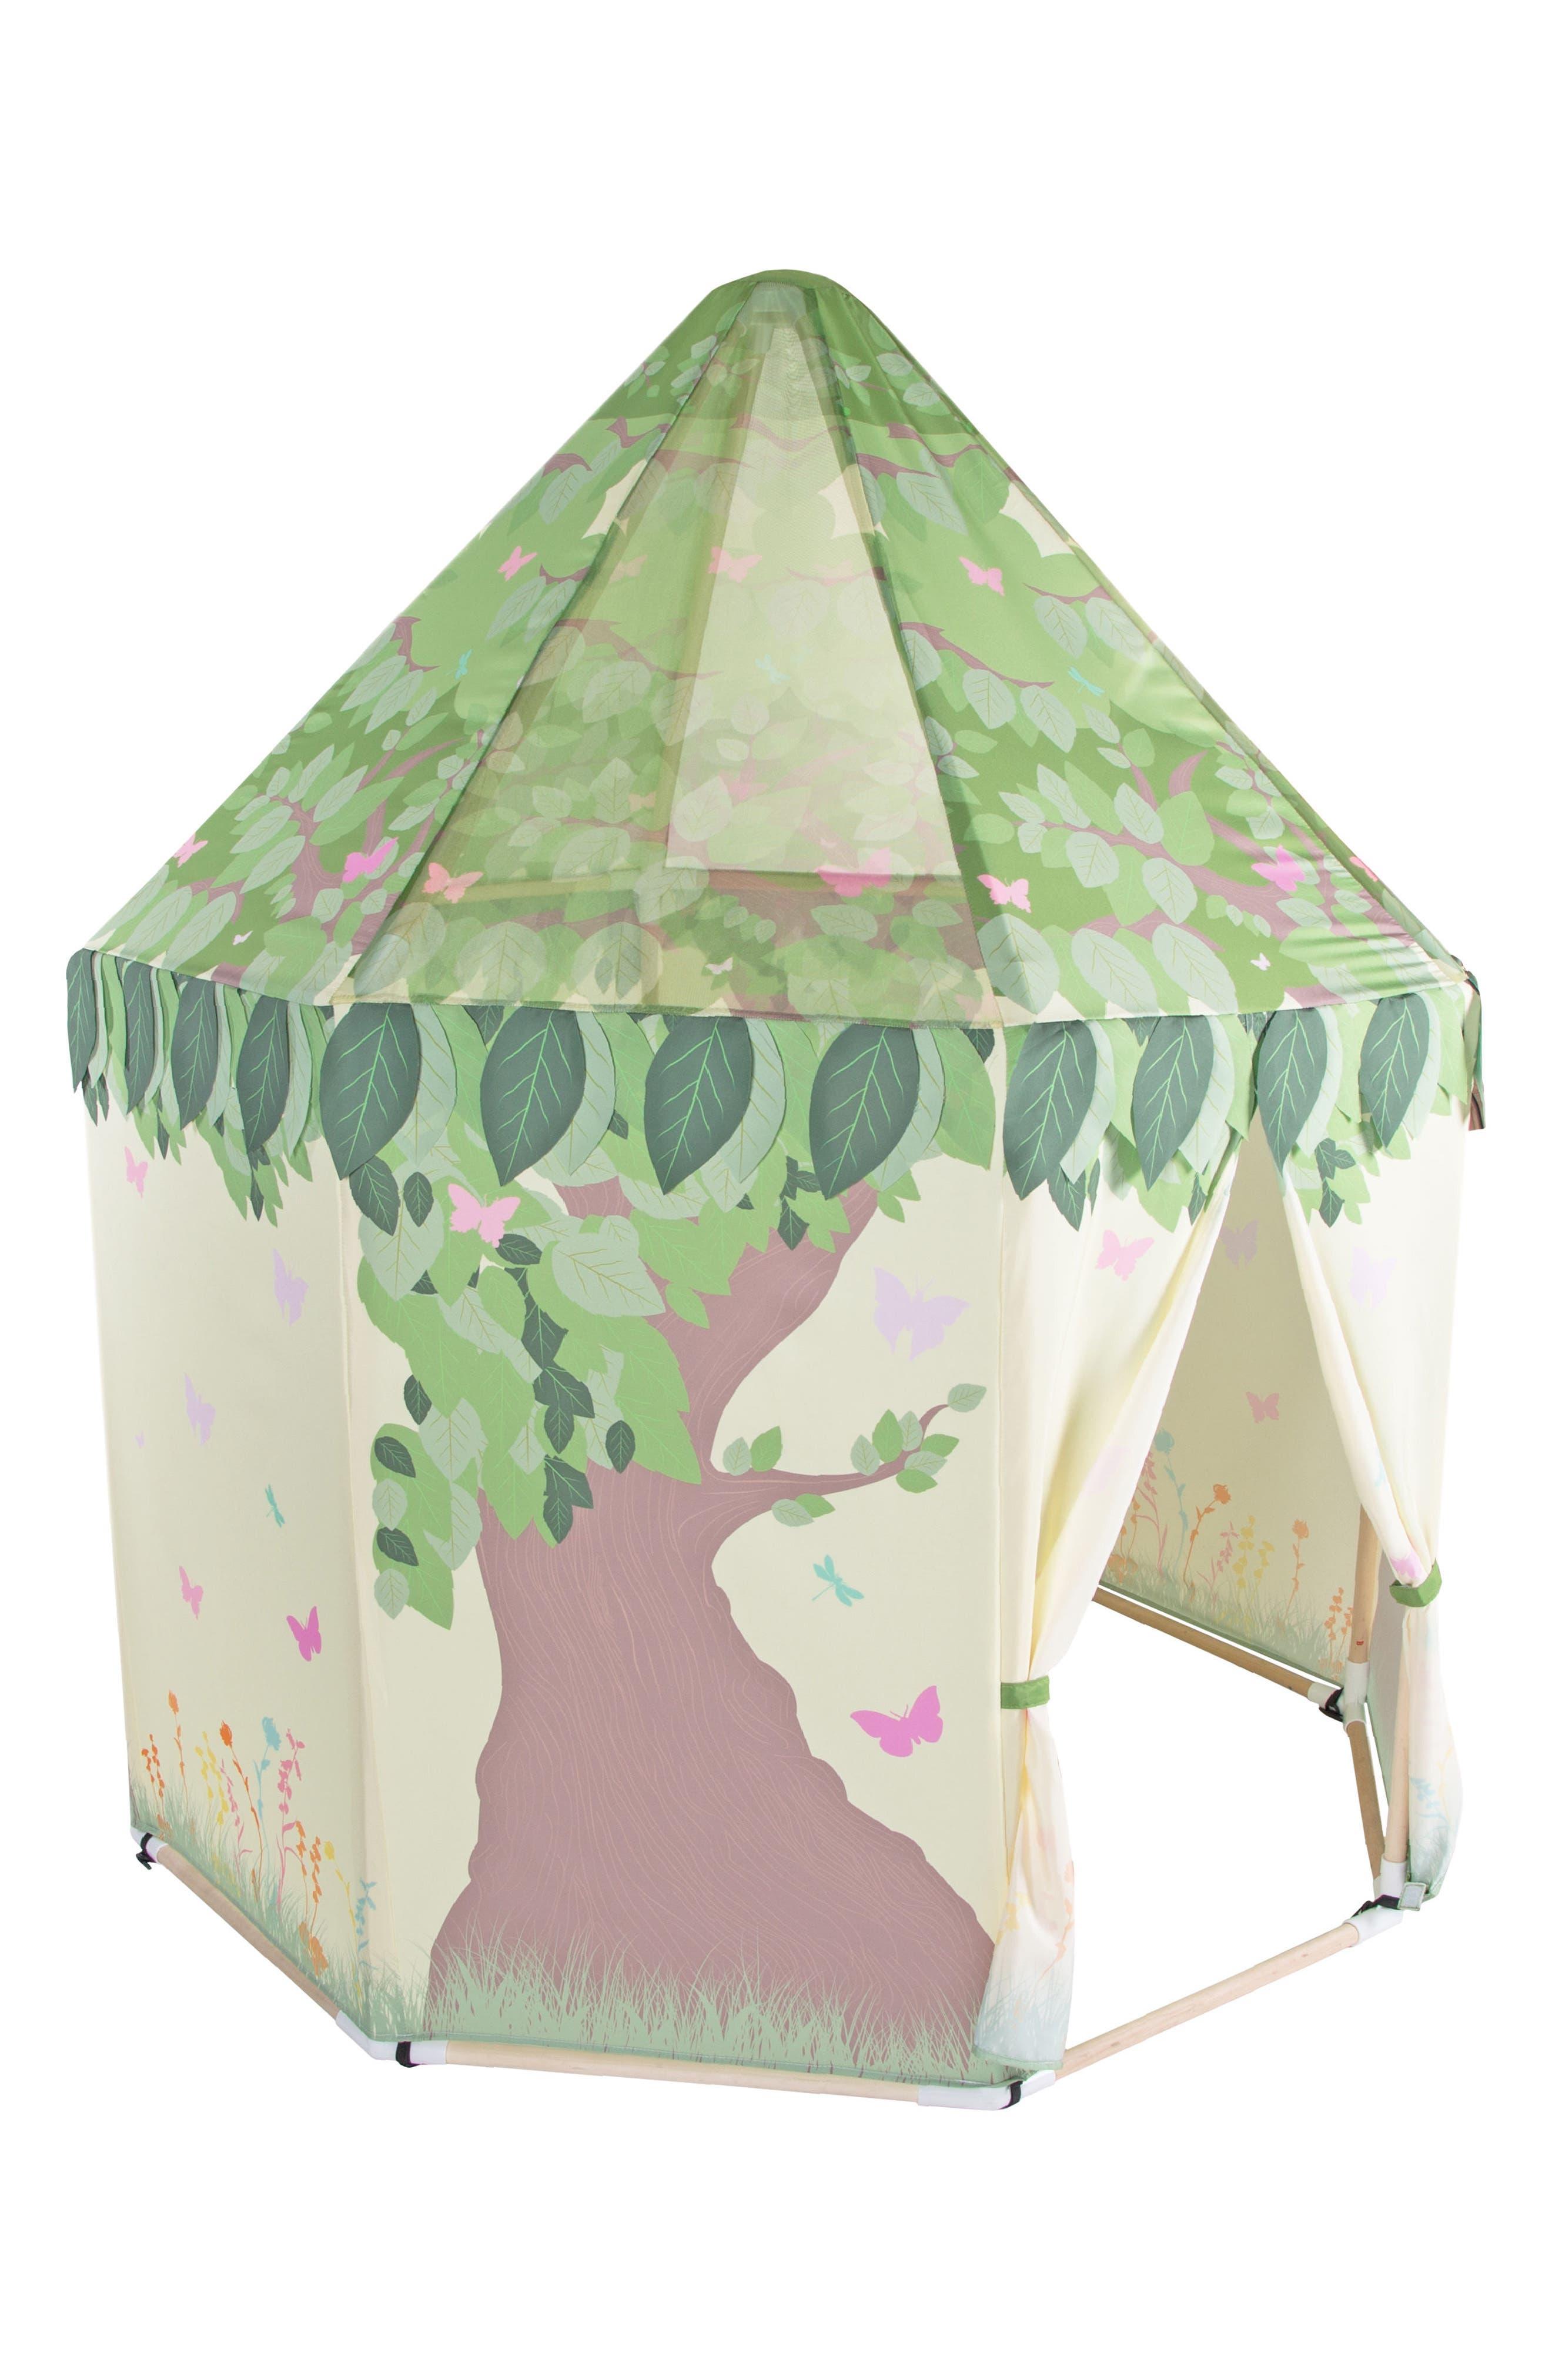 Butterfly Garden Tent,                             Main thumbnail 1, color,                             GREEN